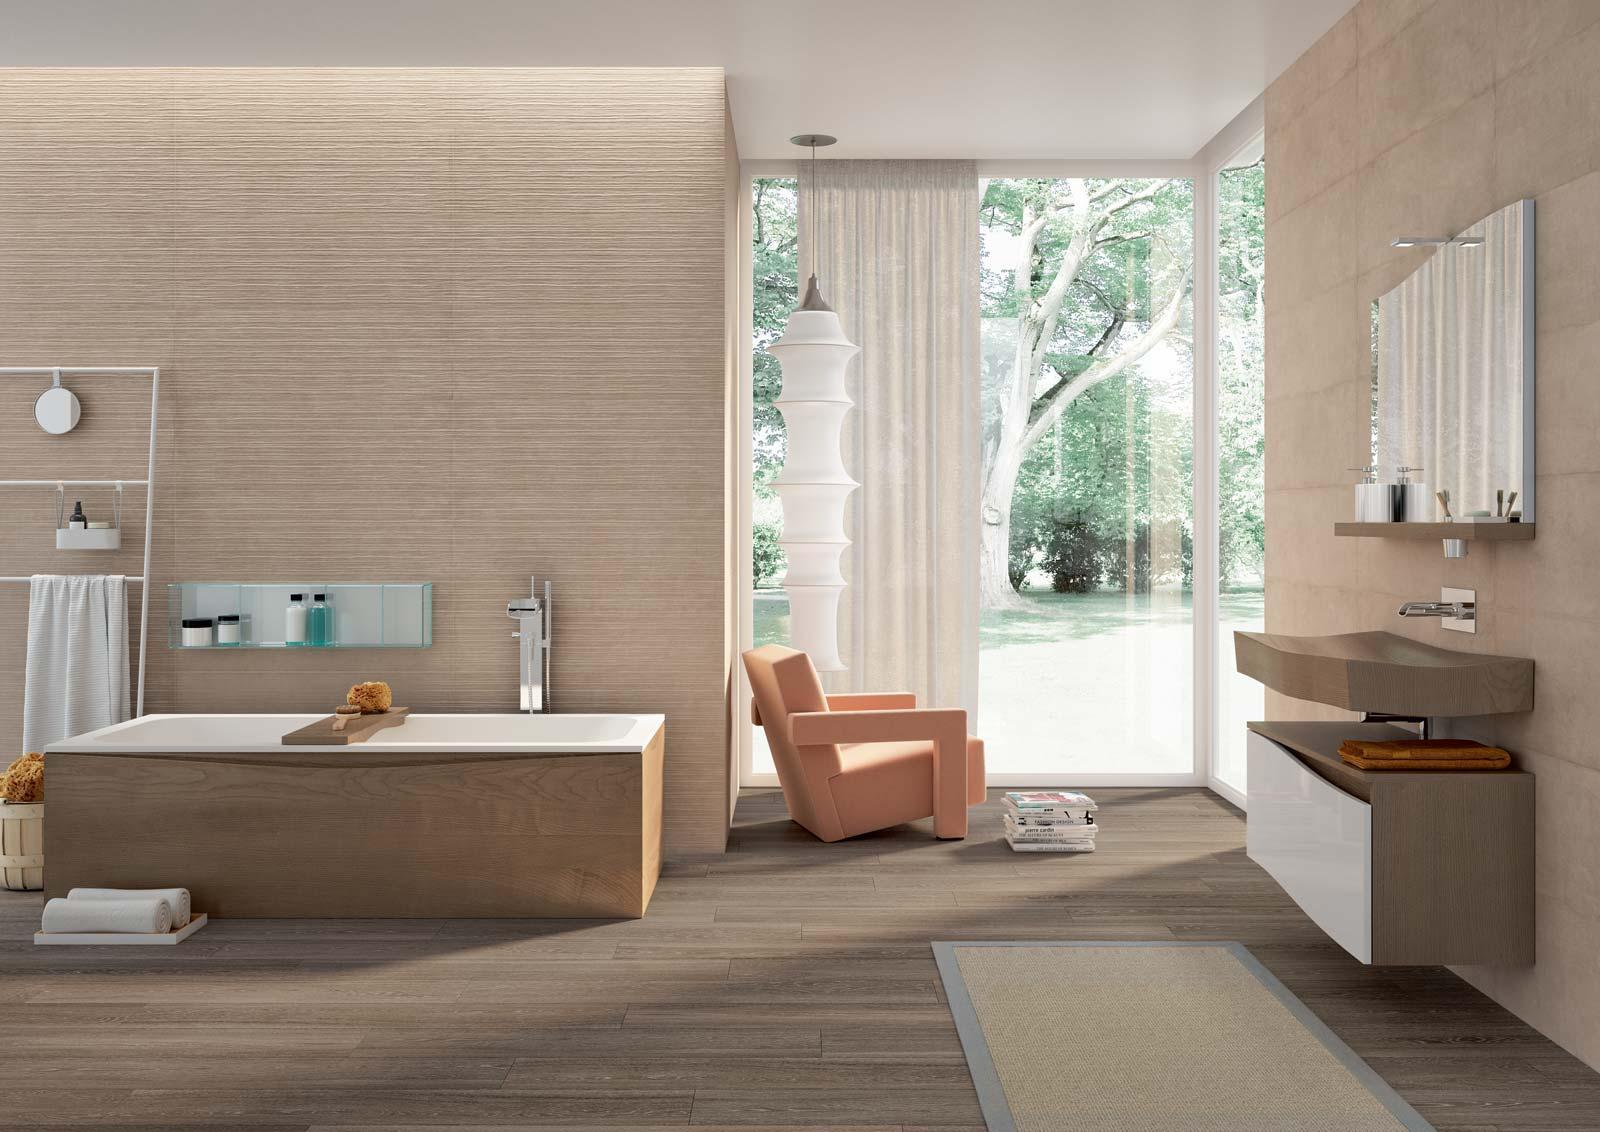 Idee rivestimento bagno: Fresco & Fabric by Marazzi – Garbi ...